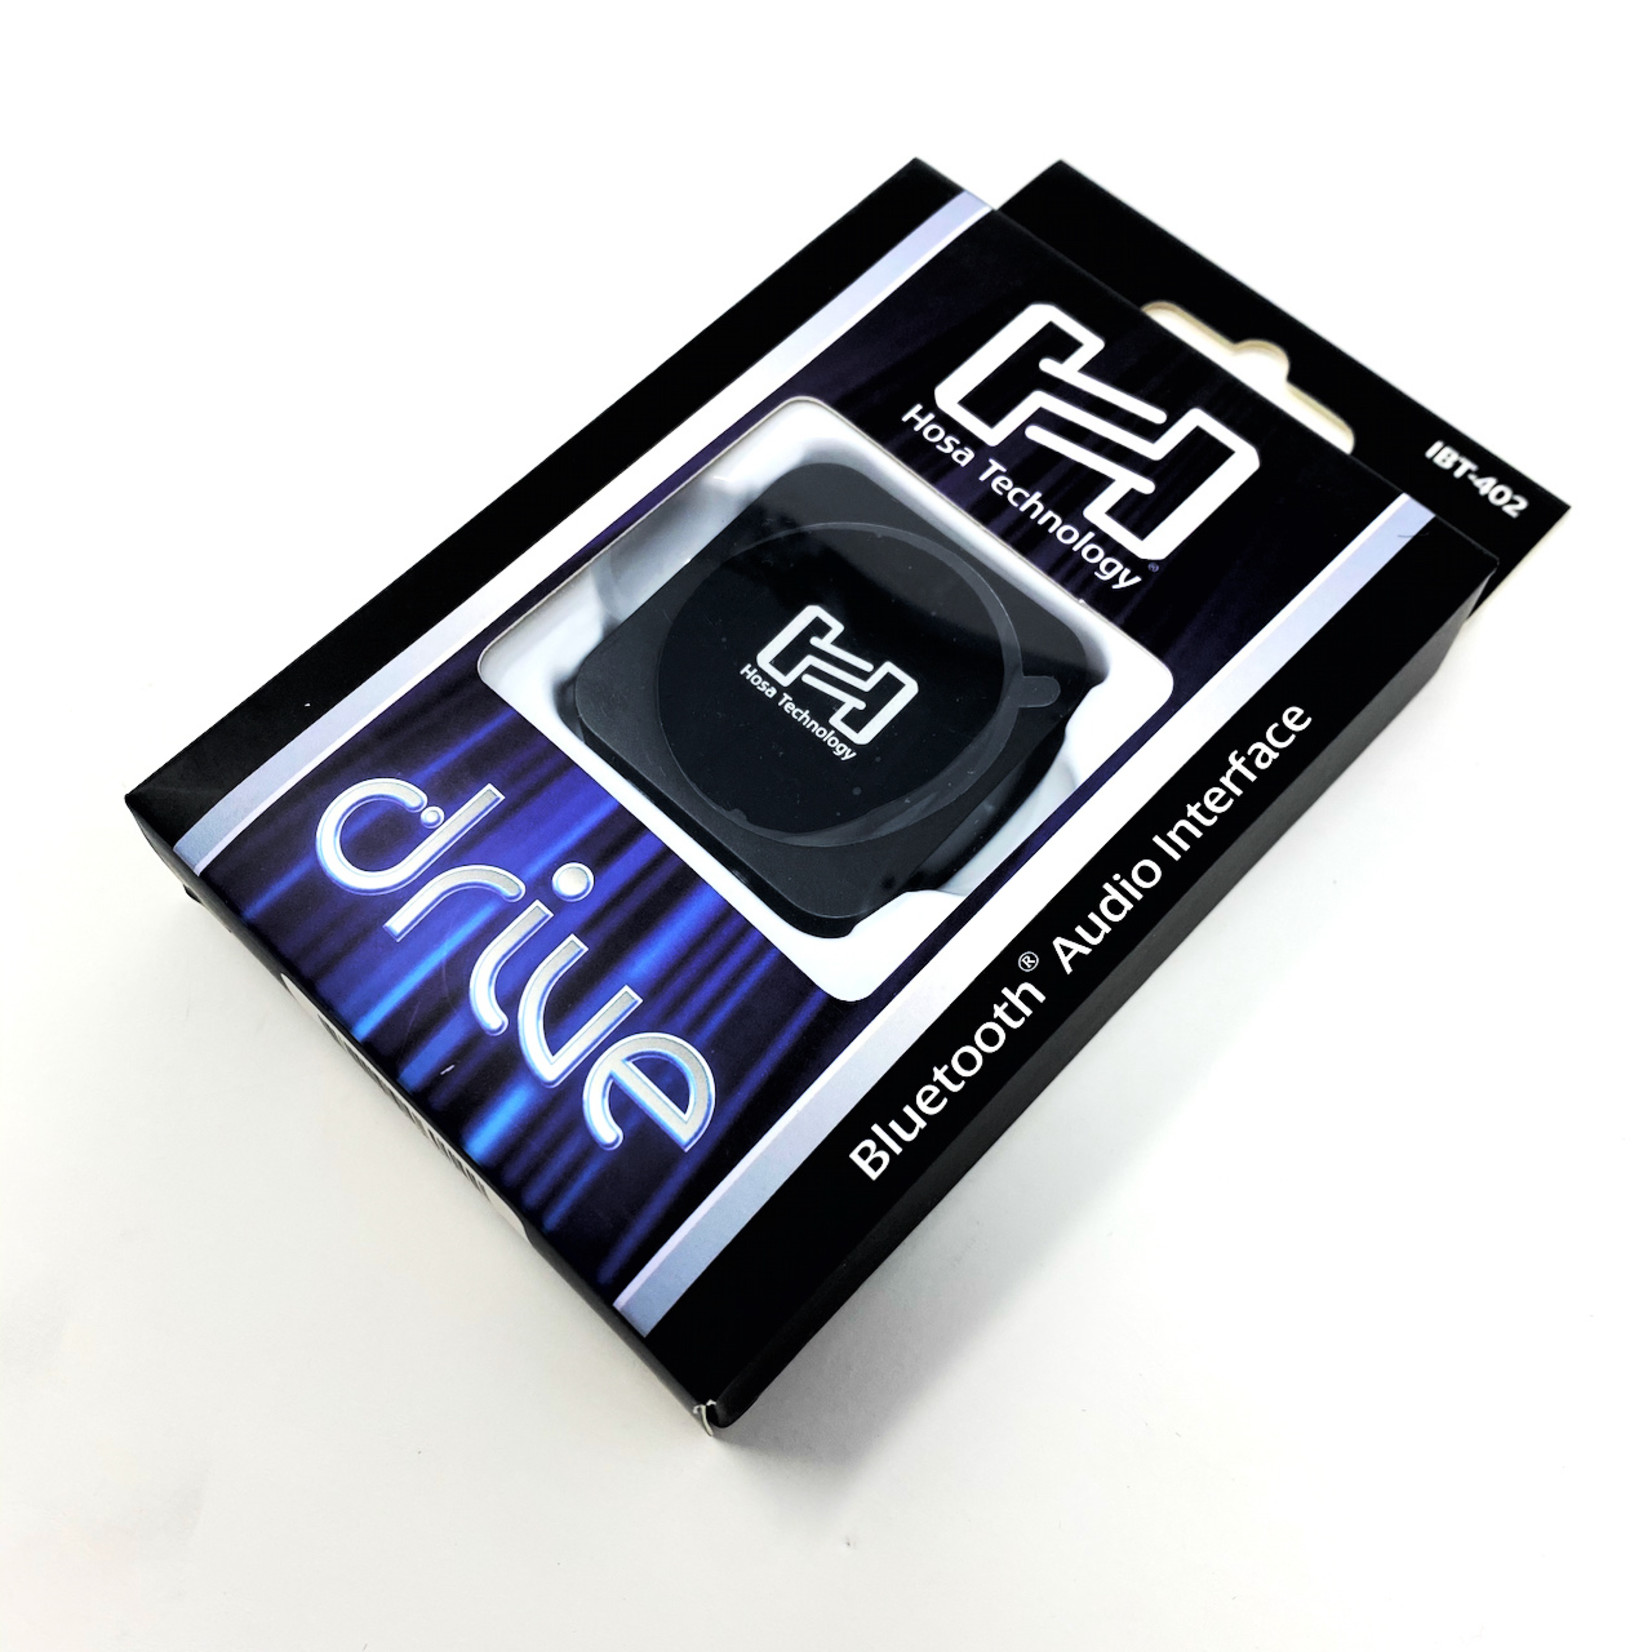 Hosa Hosa Drive Bluetooth Audio Interface, Transmitter/Receiver, Stereo 3.5 mm TRS Jack (IBT-402)